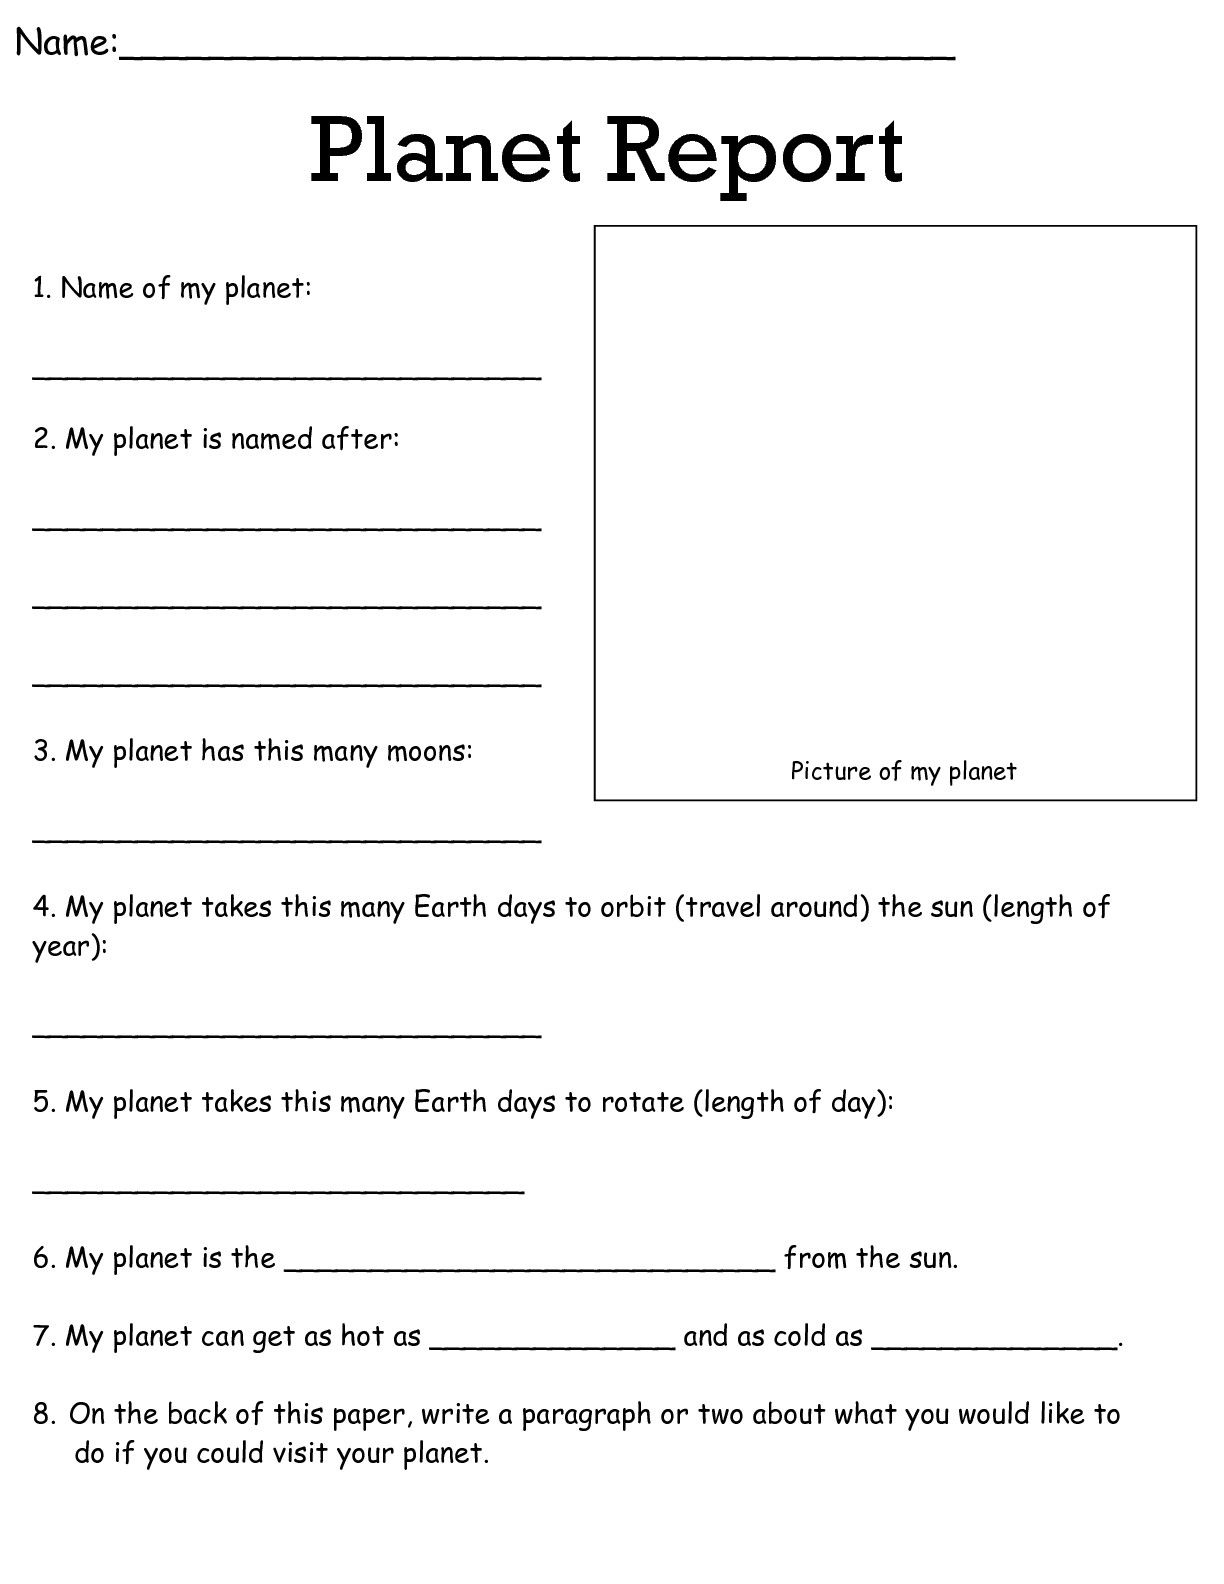 Job Worksheets 5Th &6Th   Science Worksheets Science Worksheets   Science Worksheets For 4Th Grade Free Printable